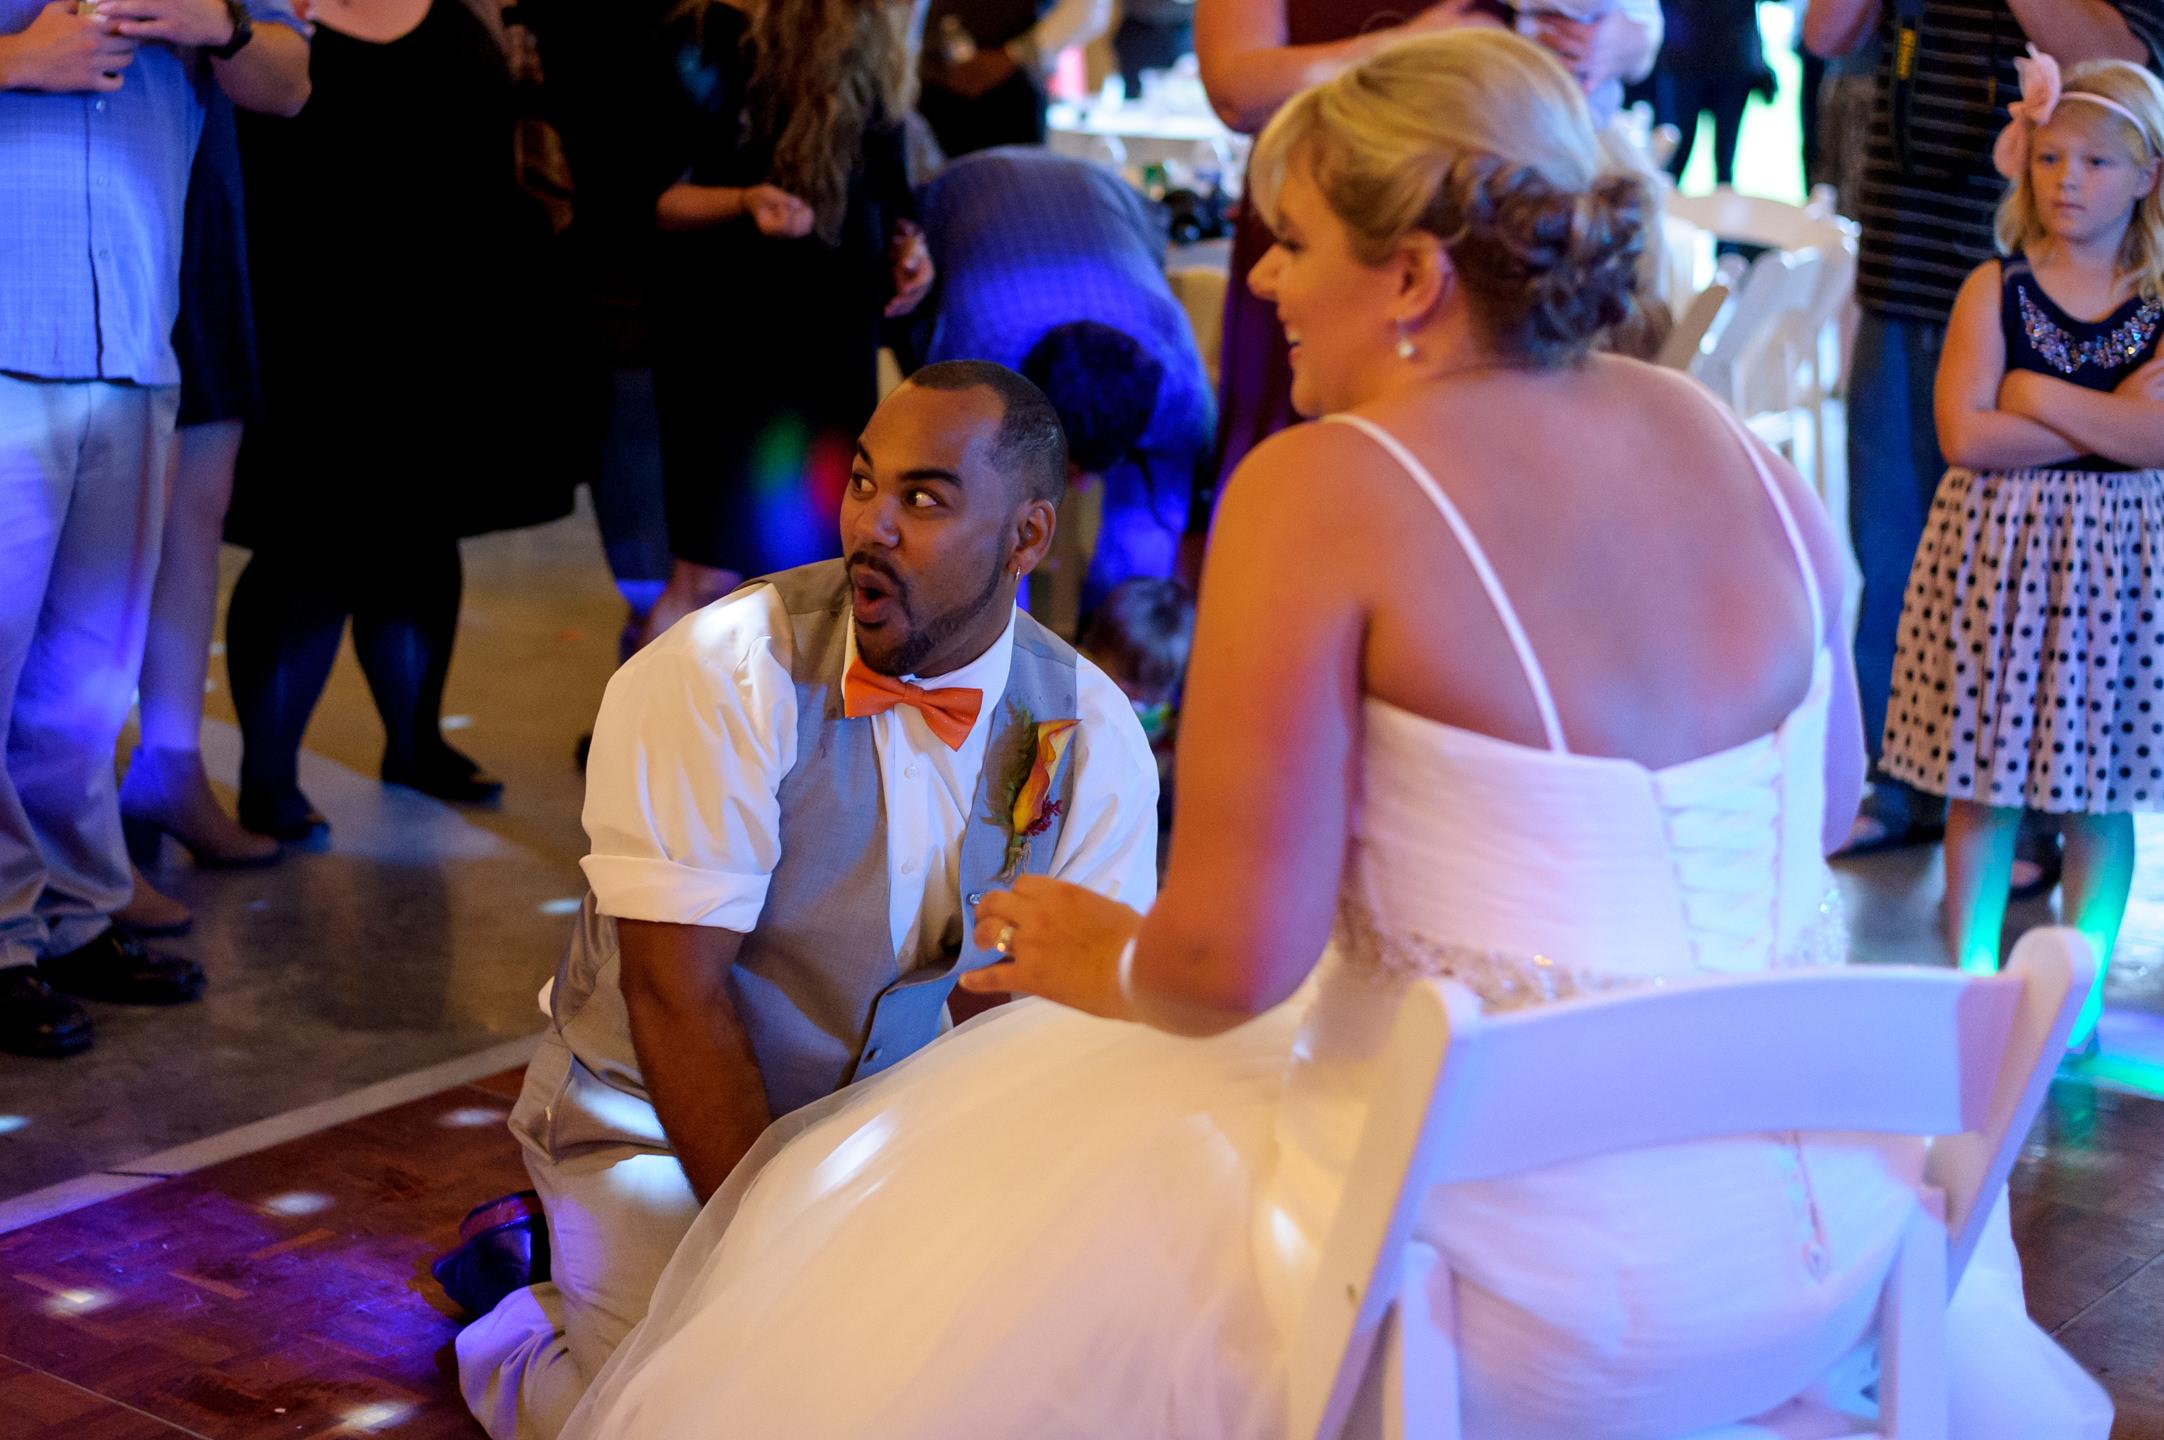 20160917_Tat_Renee and Marcus Wedding-97.jpg